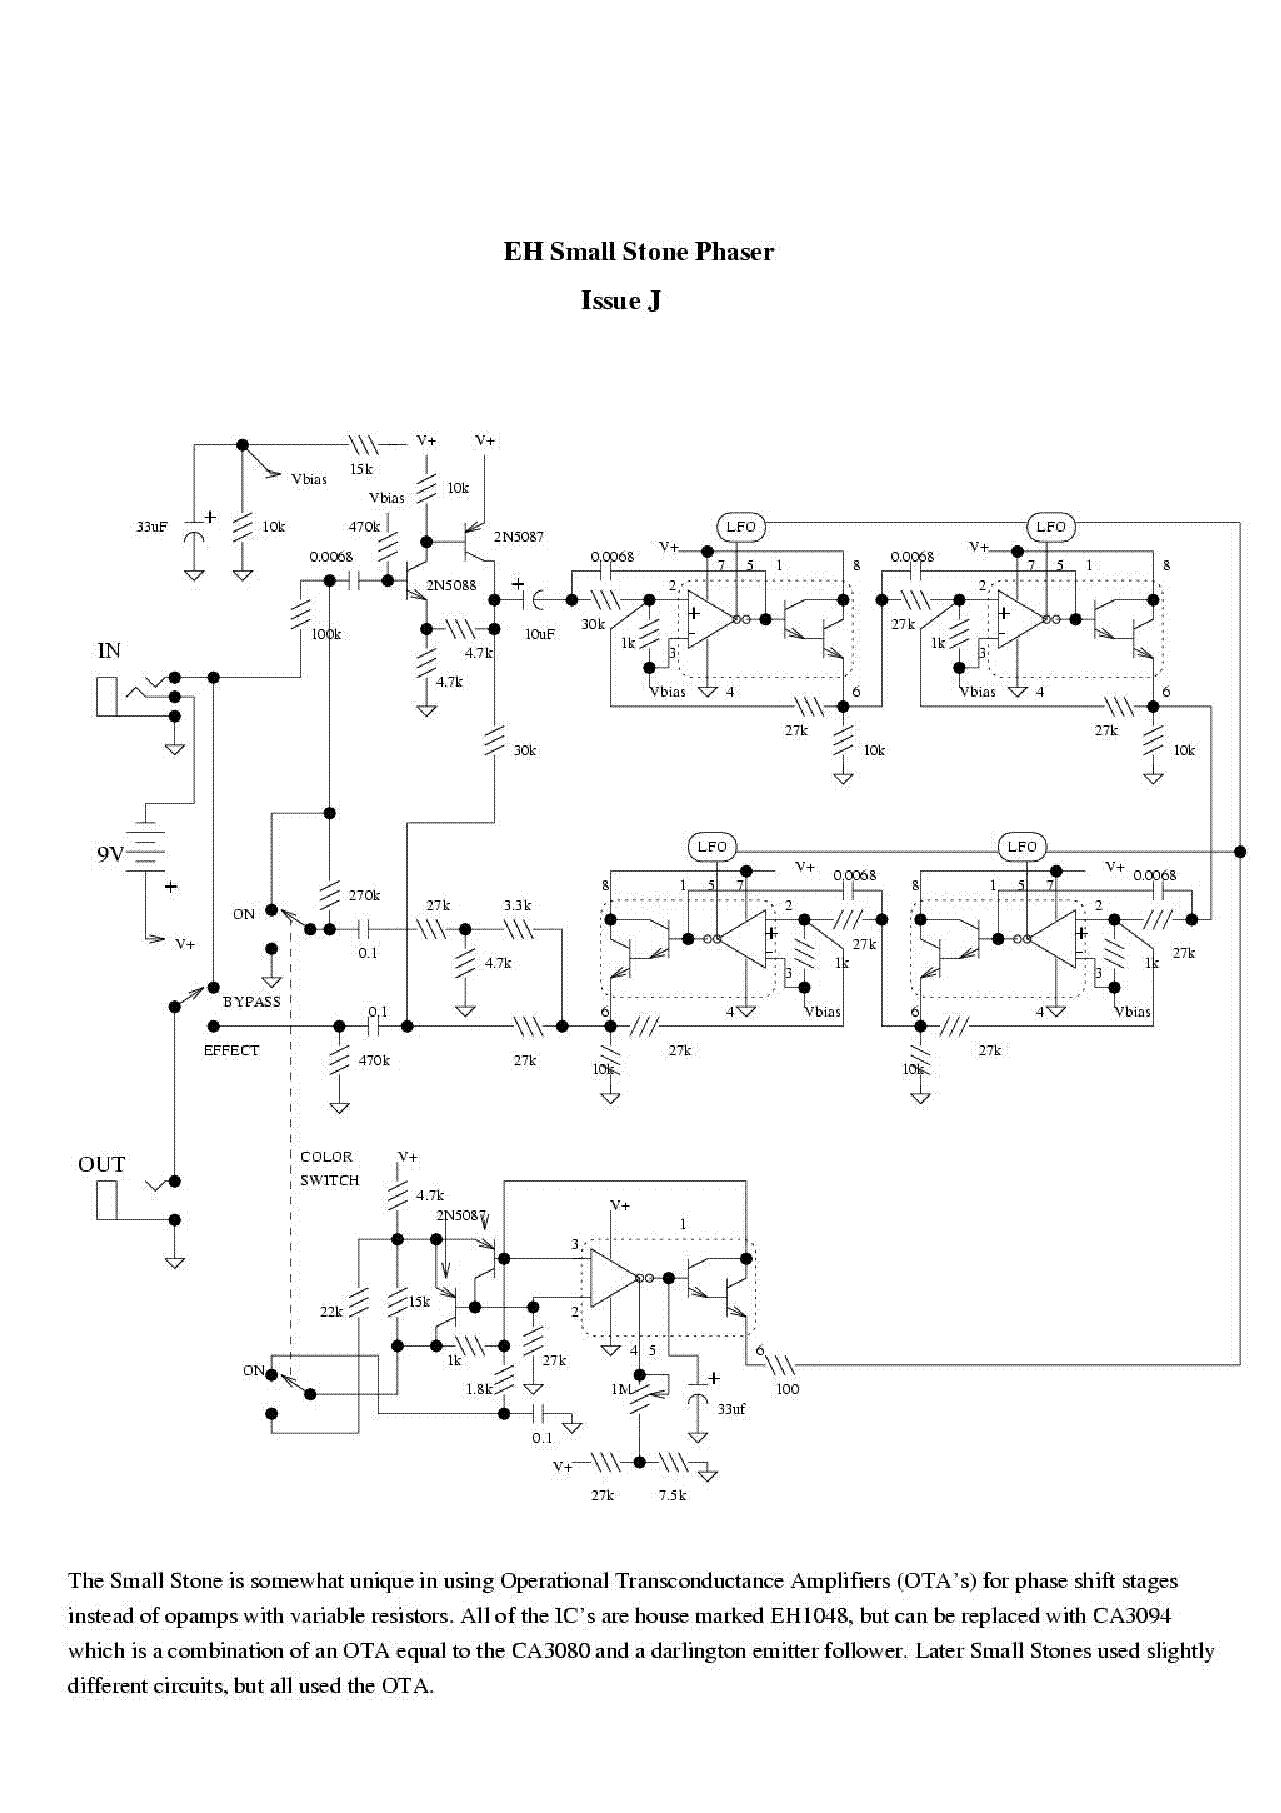 ELECTRO-HARMONIX SMALL STONE PHASER SCH Service Manual download ...